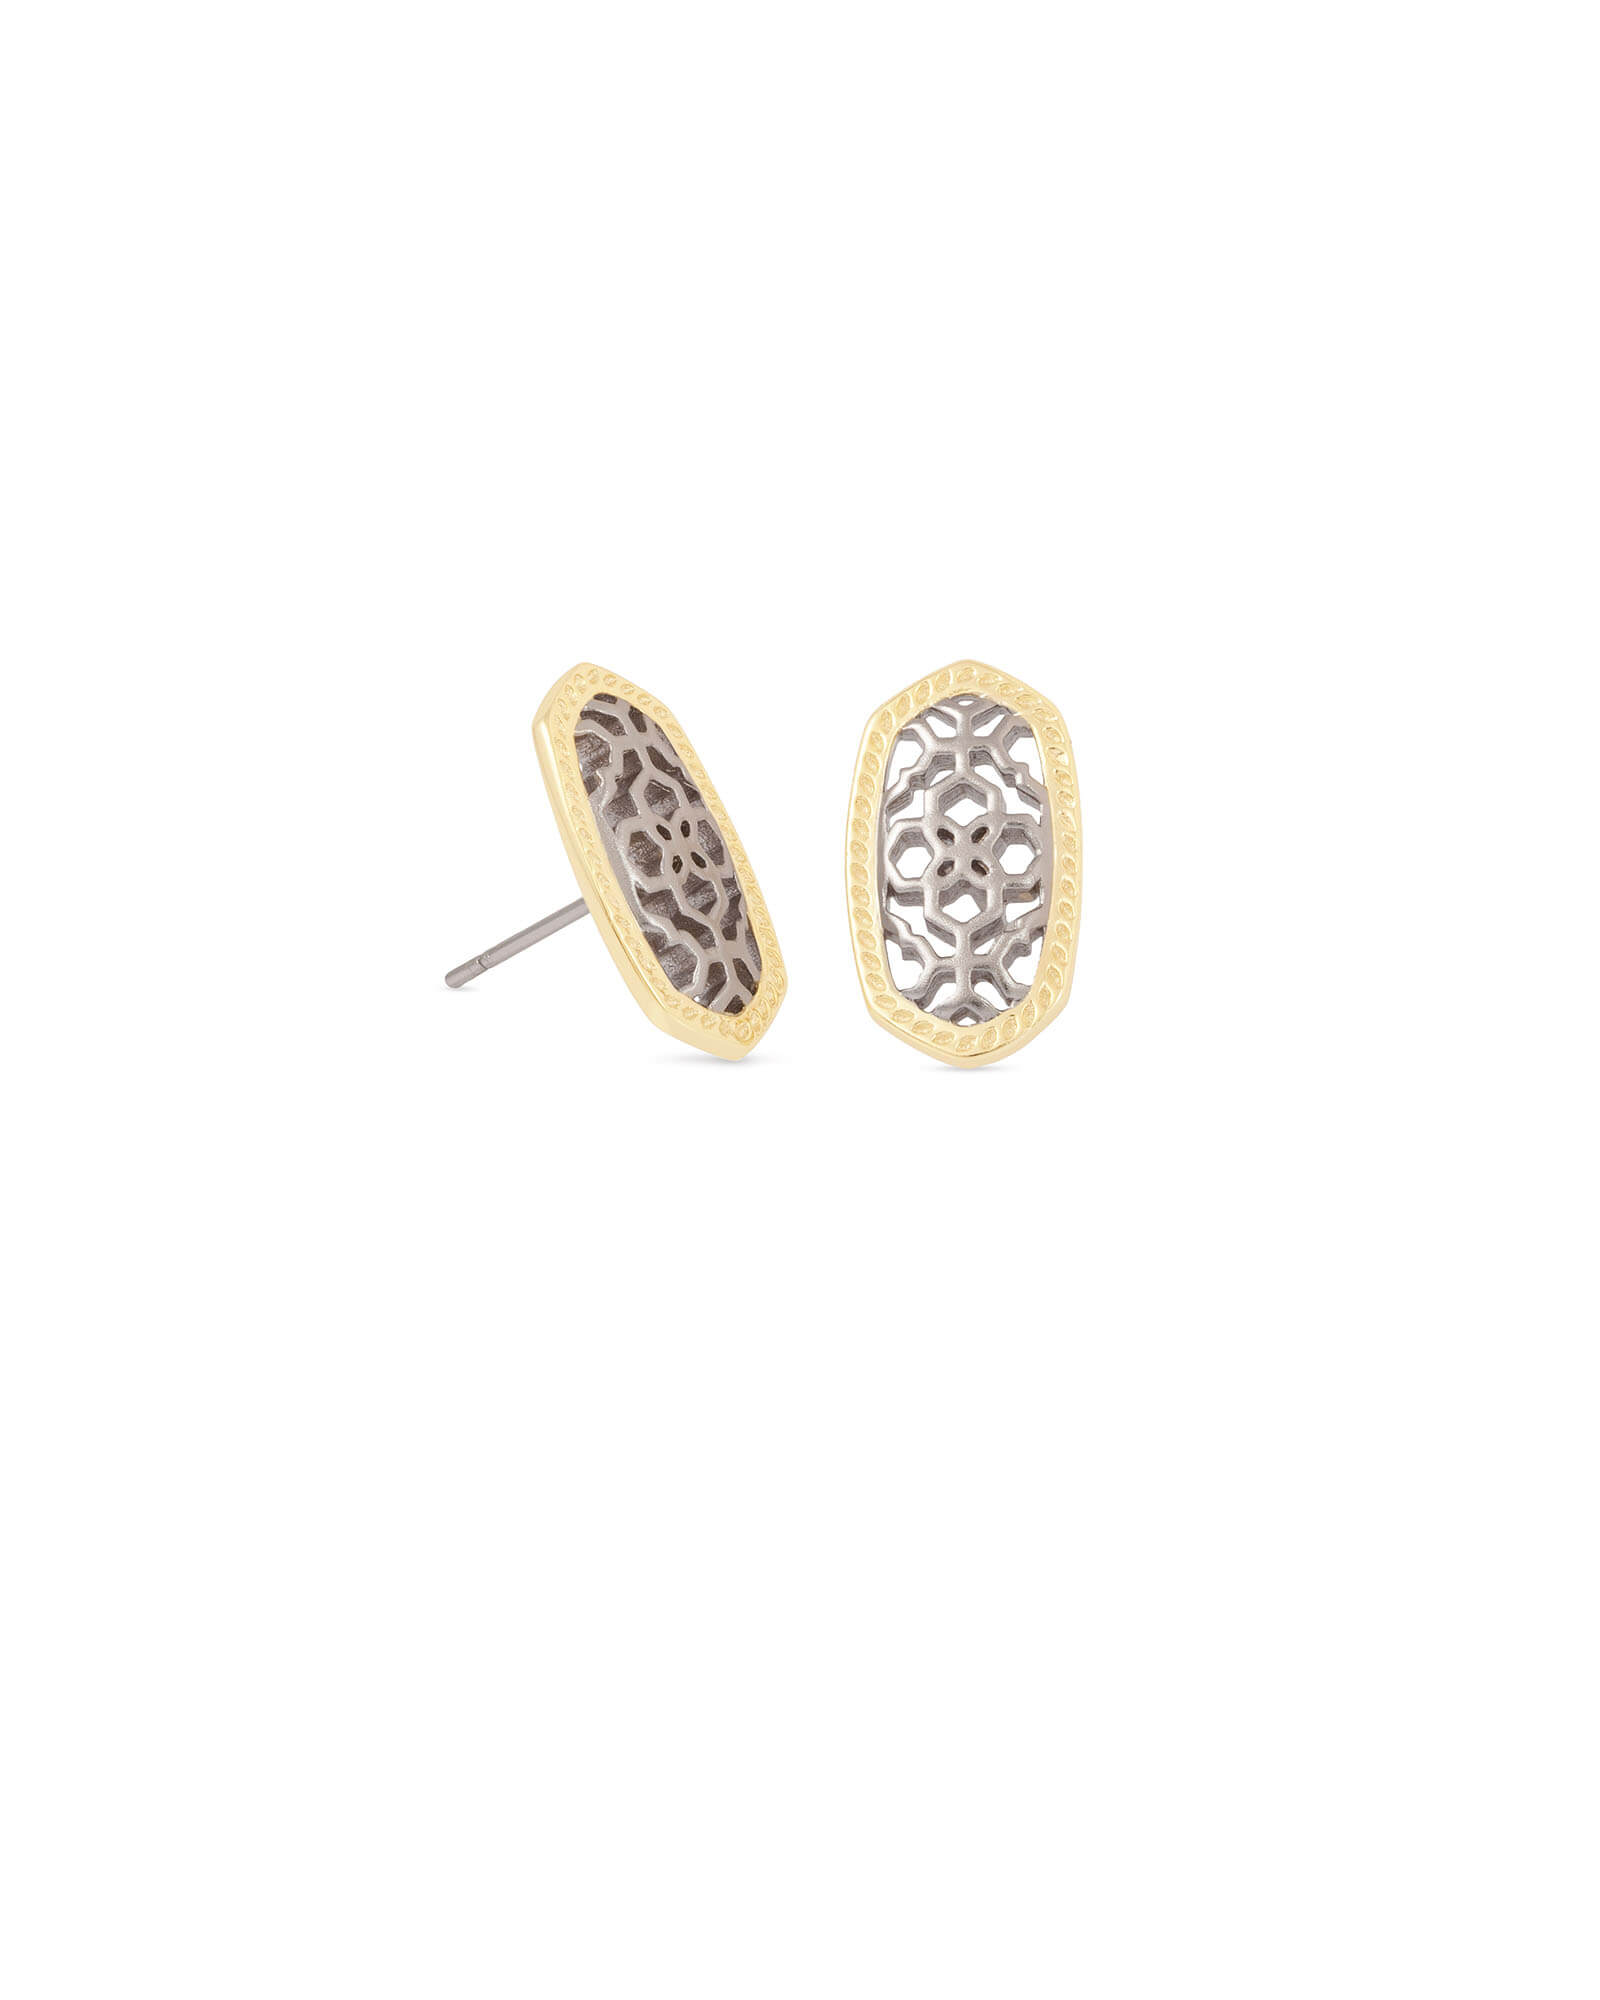 Ellie Gold Stud Earrings In Silver Filigree Mix